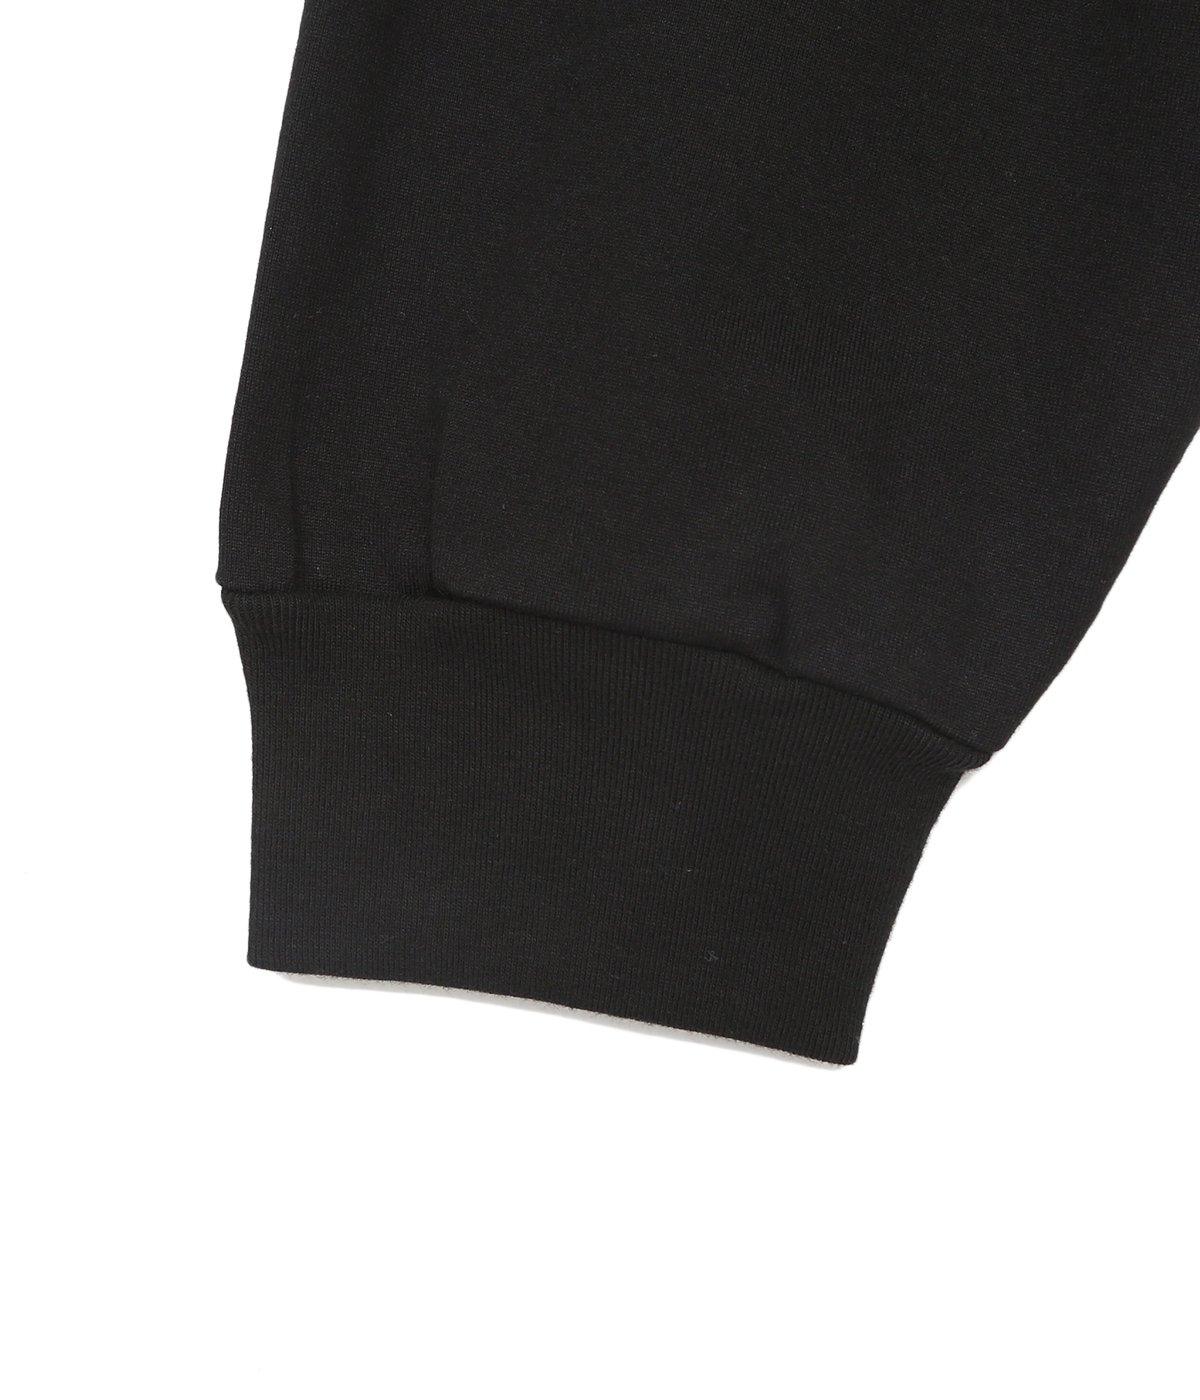 Jersey L/S Pocket Tee